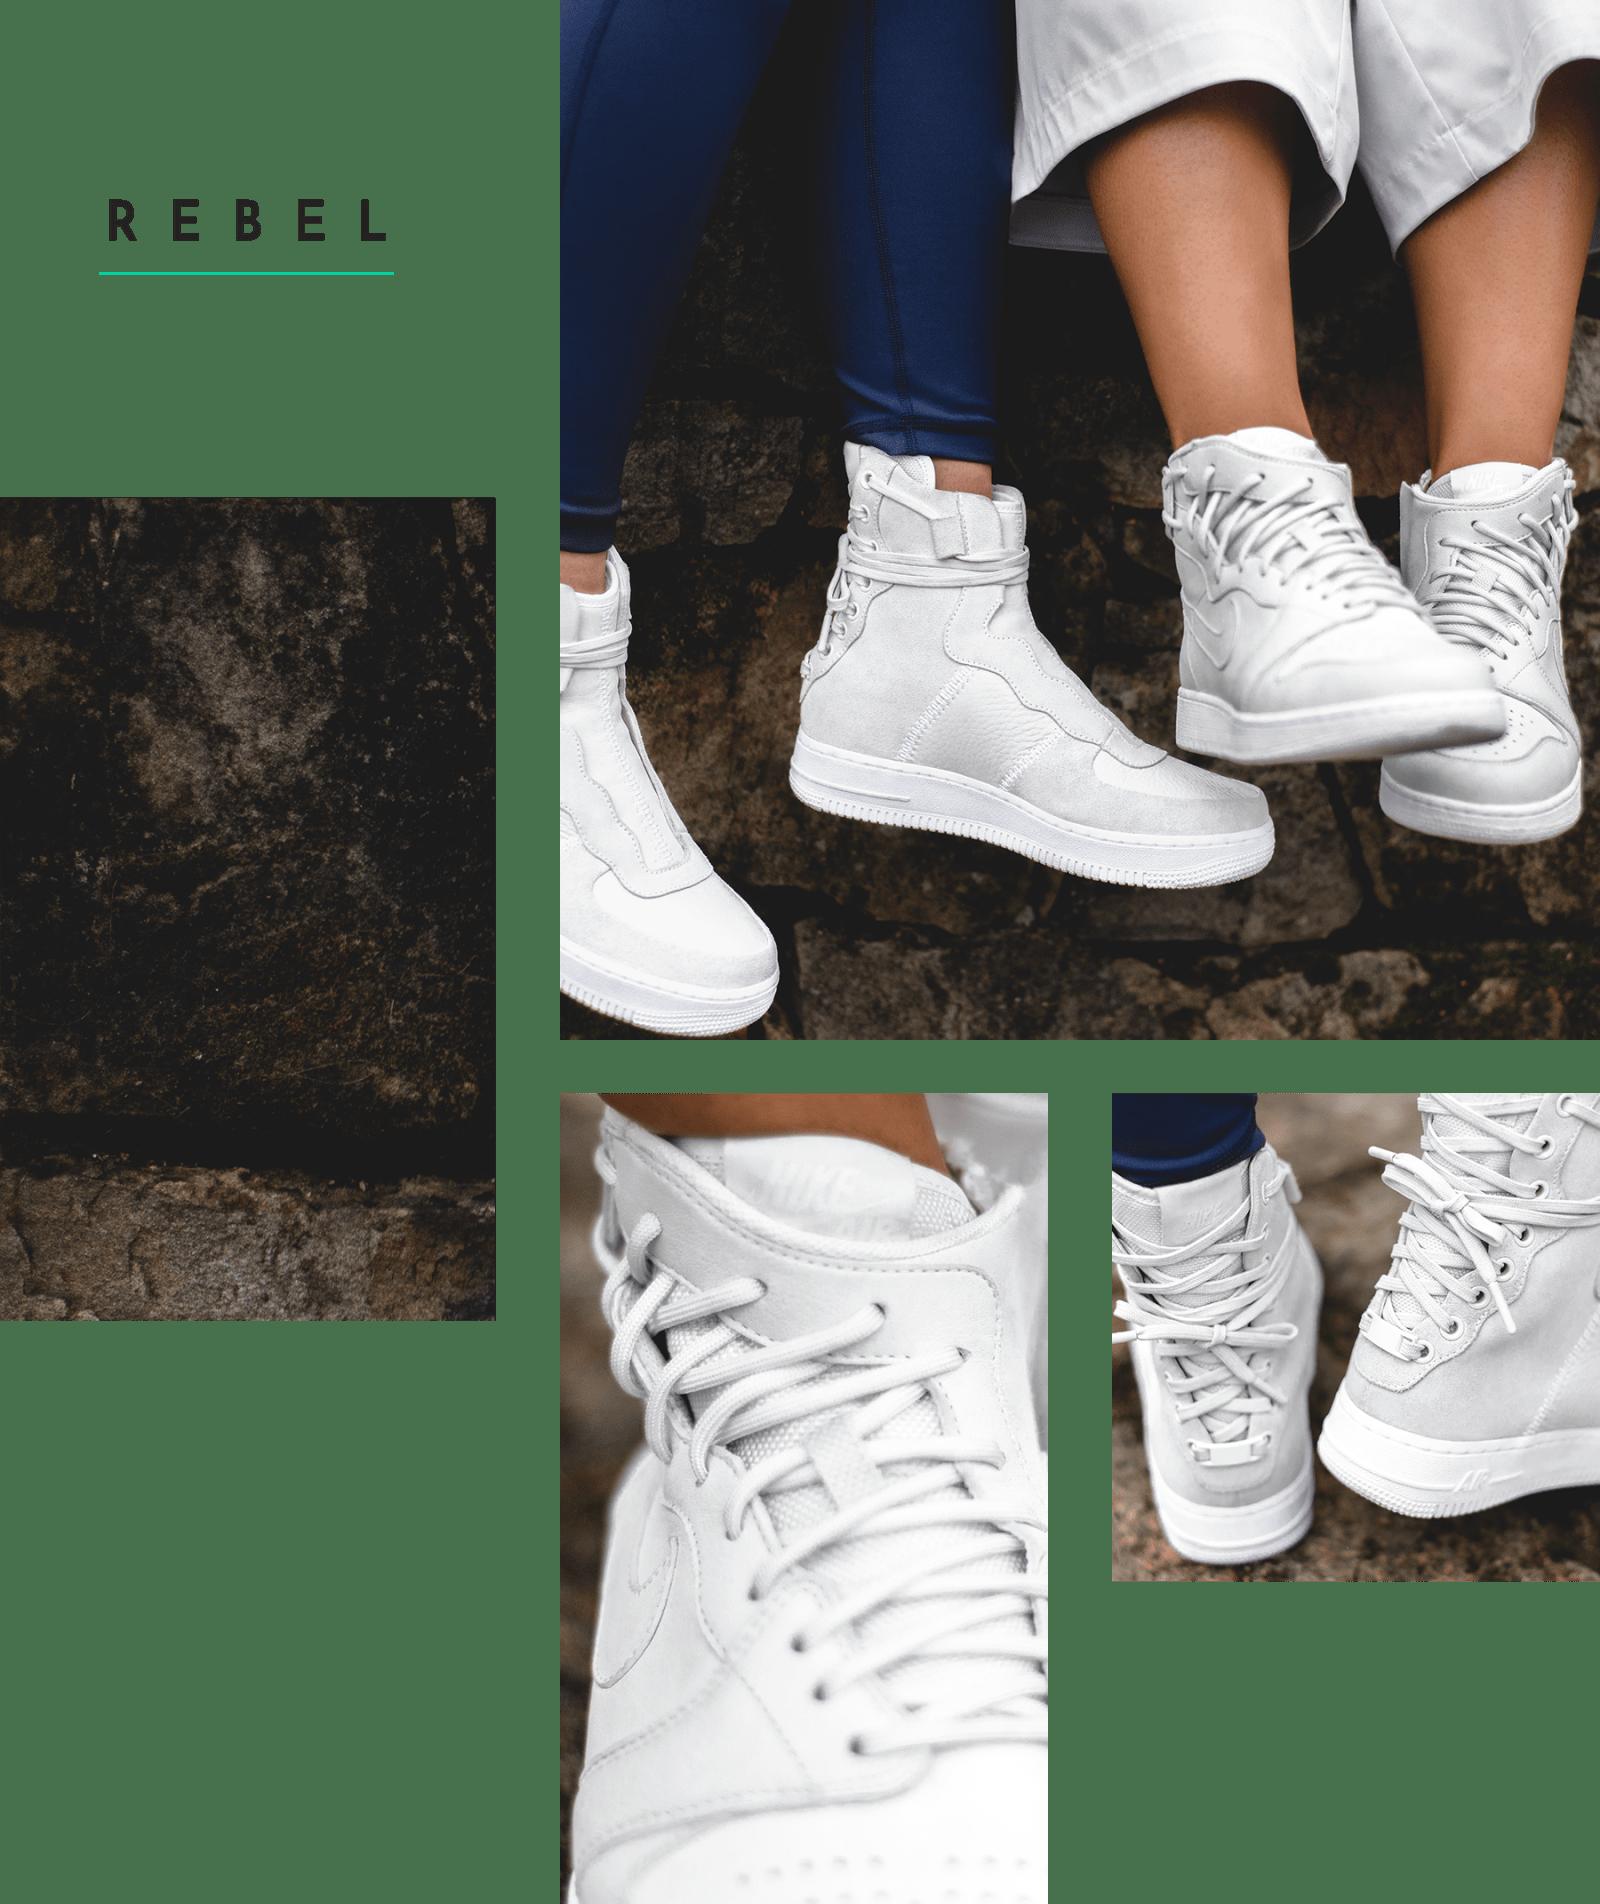 On Feet Look At Nike S The 1 Reimagined Rebel Hypebae